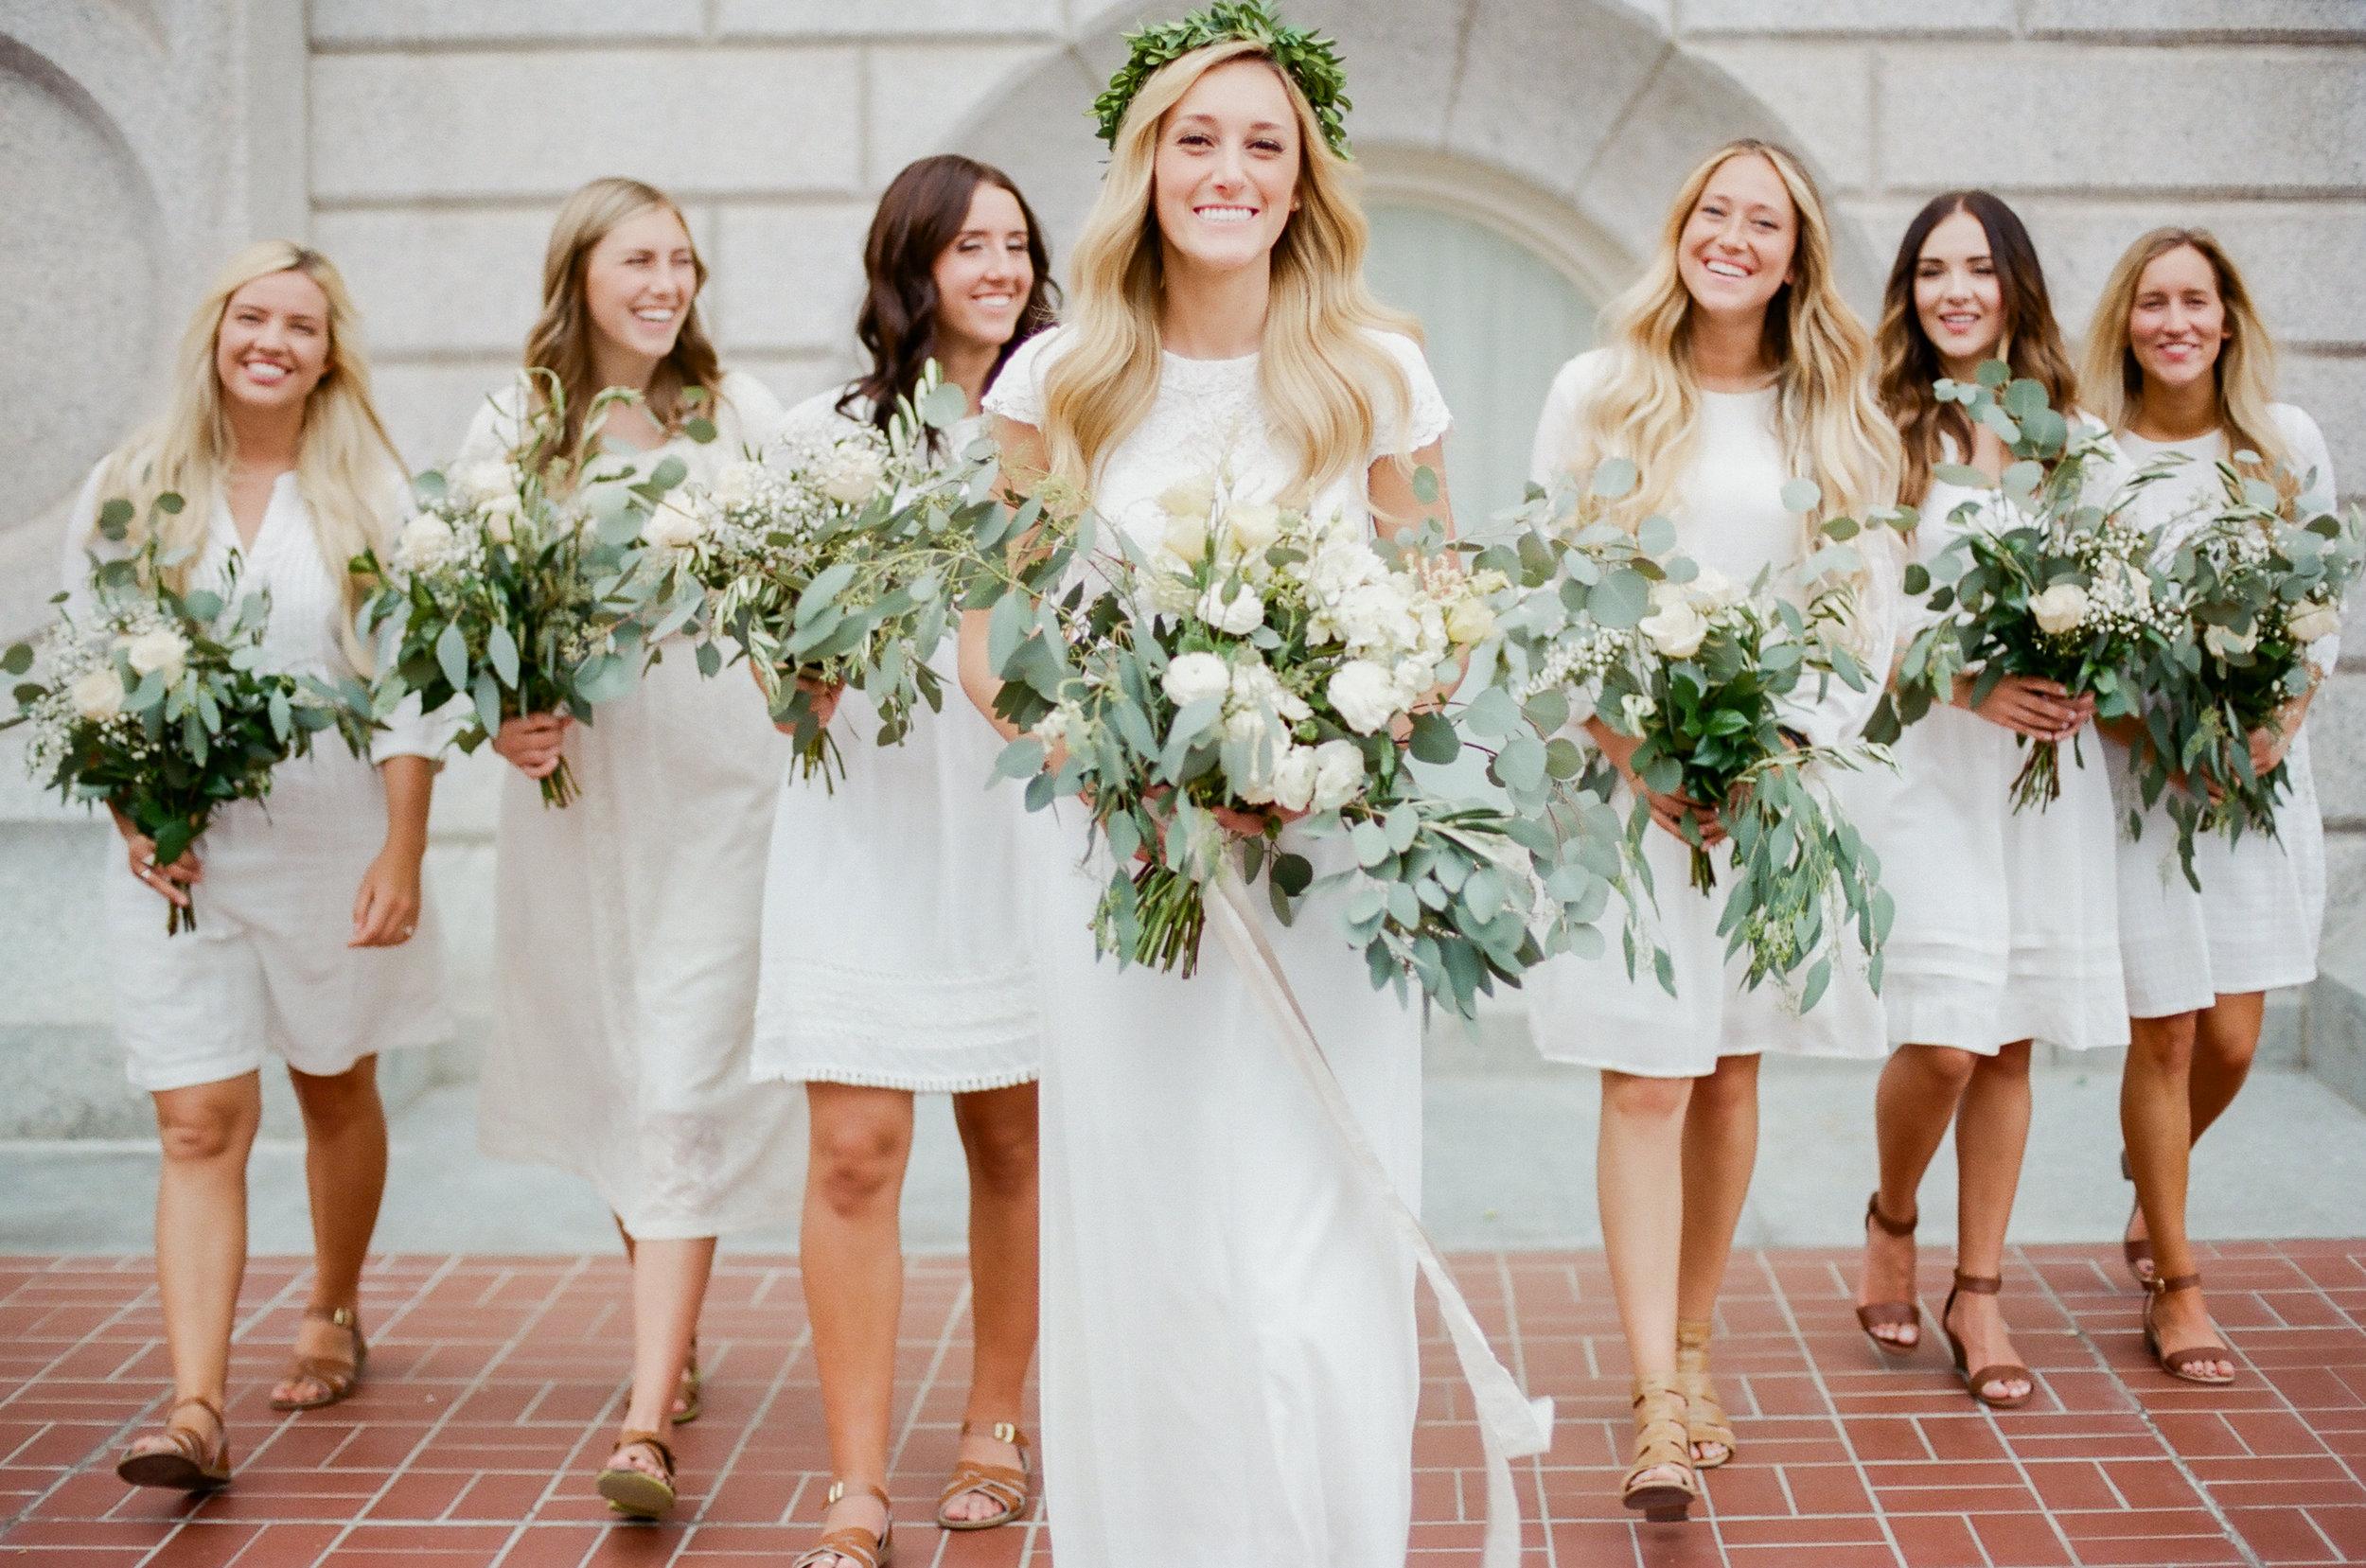 Wynona Benson Photography - Jaleisa & Logan Romantic Elegant Utah Wedding00013.jpg